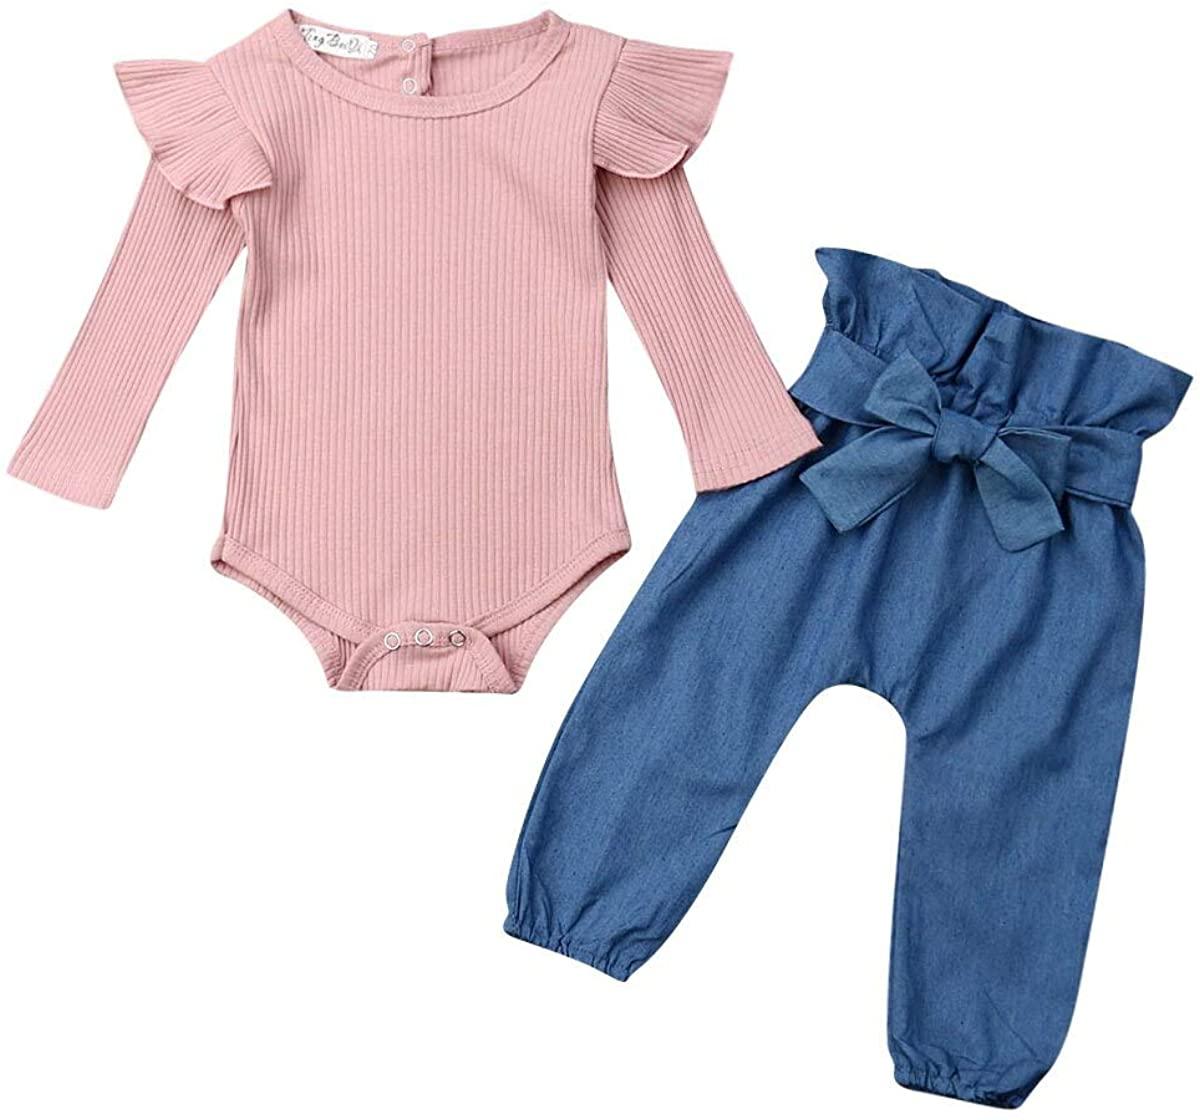 LXXIASHI 2pcs Infant Newborn Baby Girls Long Ruffle Romper Tops + Pants Clothes Outfit Sets